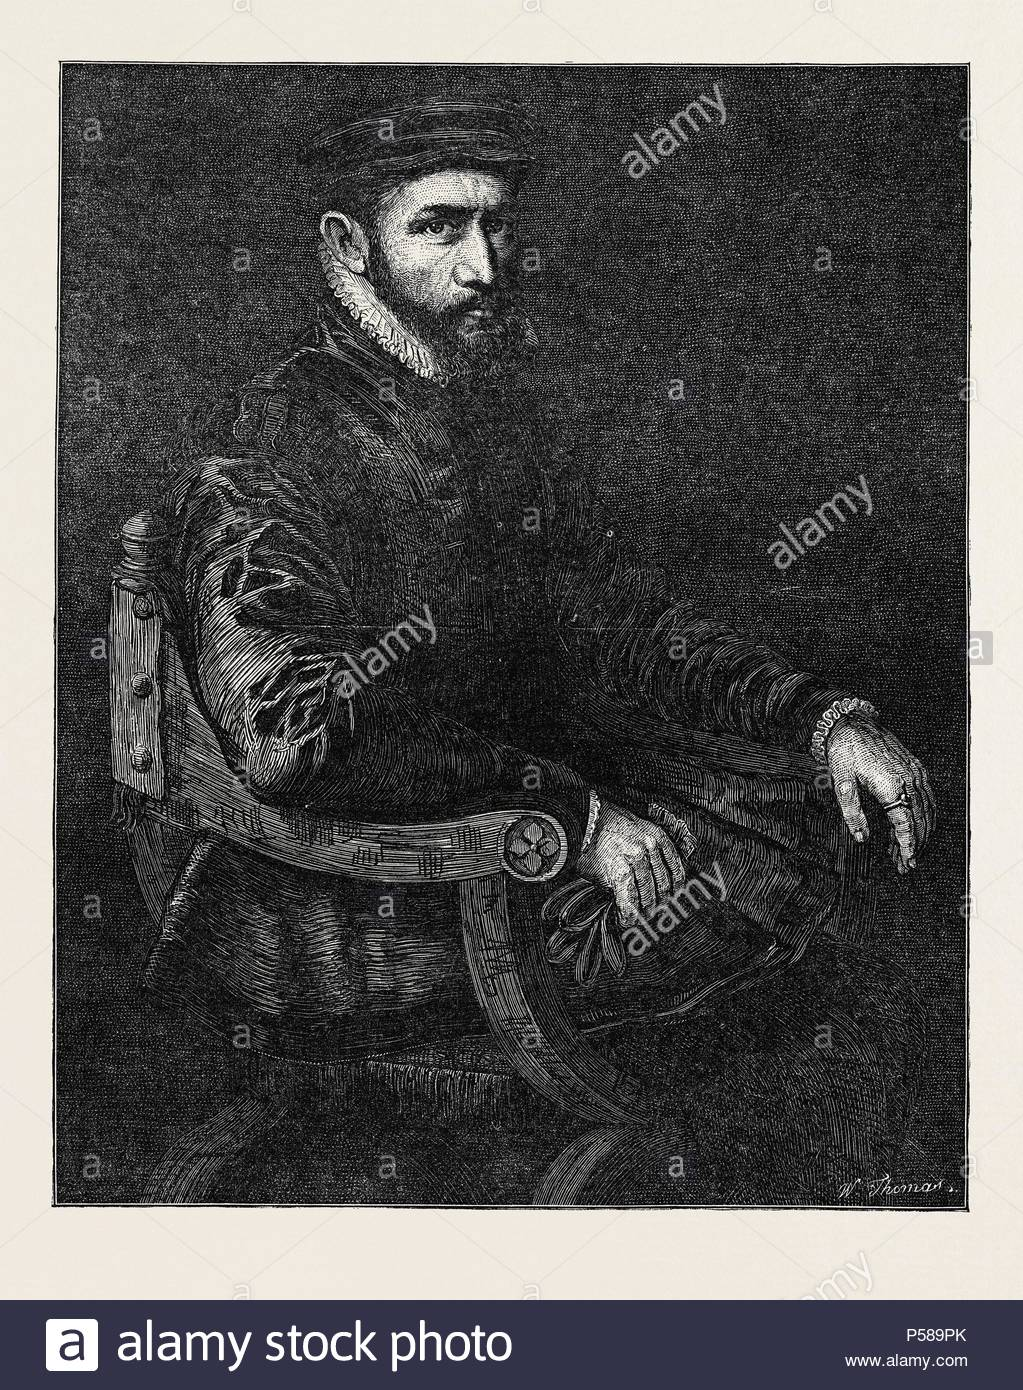 SIR THOMAS GRESHAM, BY SIR ANTONIO MORE, IN THE NATIONAL PORTRAIT EXHIBITION, SOUTH KENSINGTON, LONDON, UK. - Stock Image